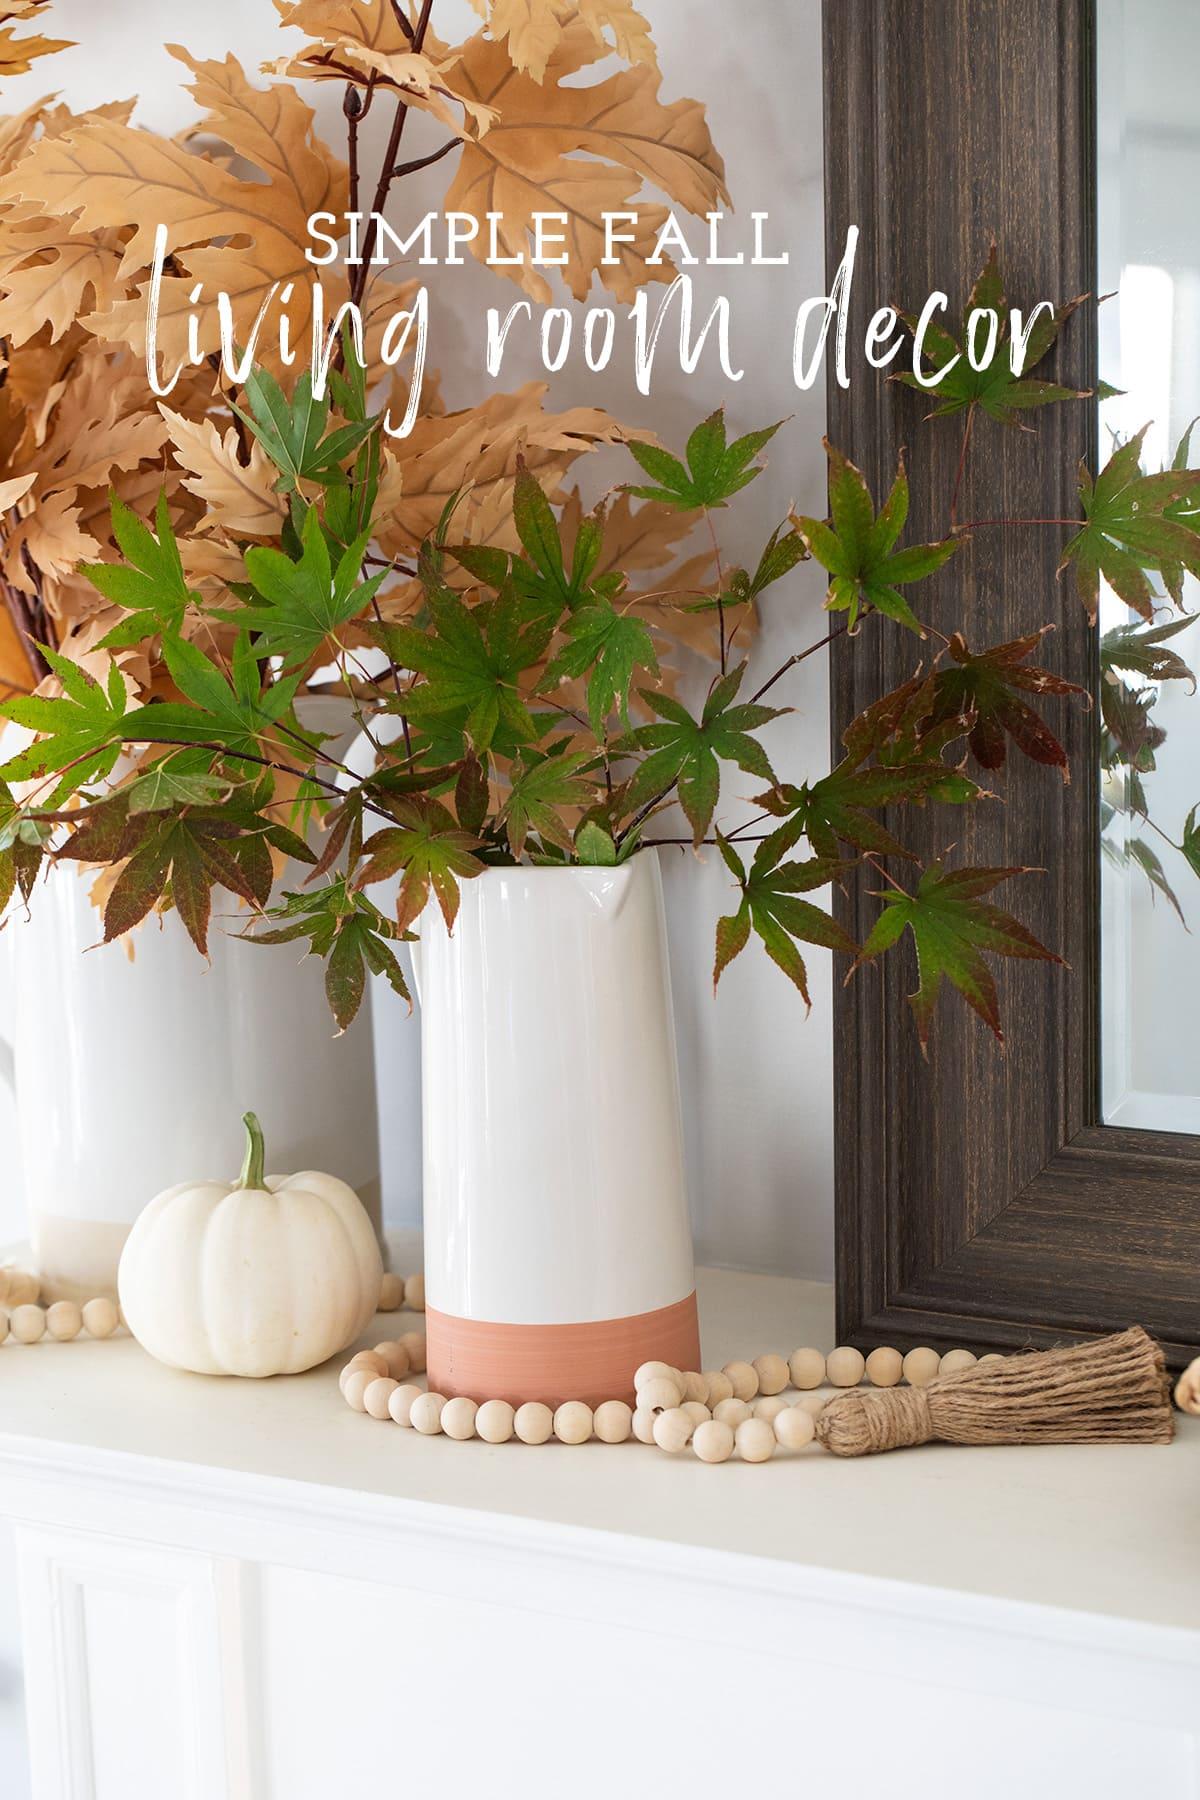 Simple Fall Living Room Decor Ideas